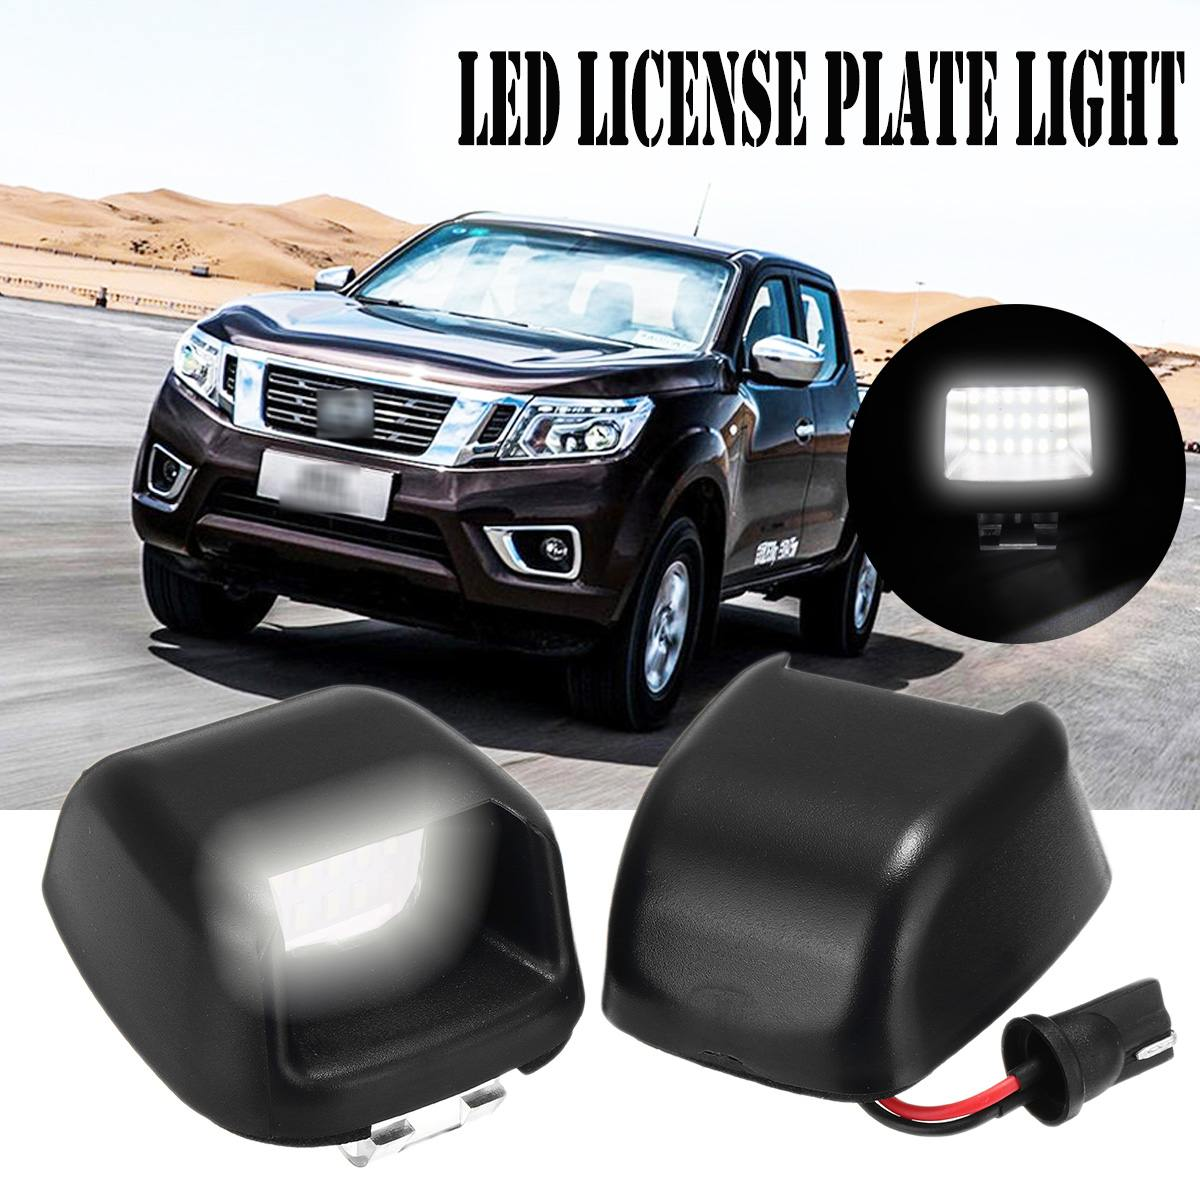 1 Pair License Plate Rear Light Lamp for 05-12 Nissan Frontier D40 Navara Pickup